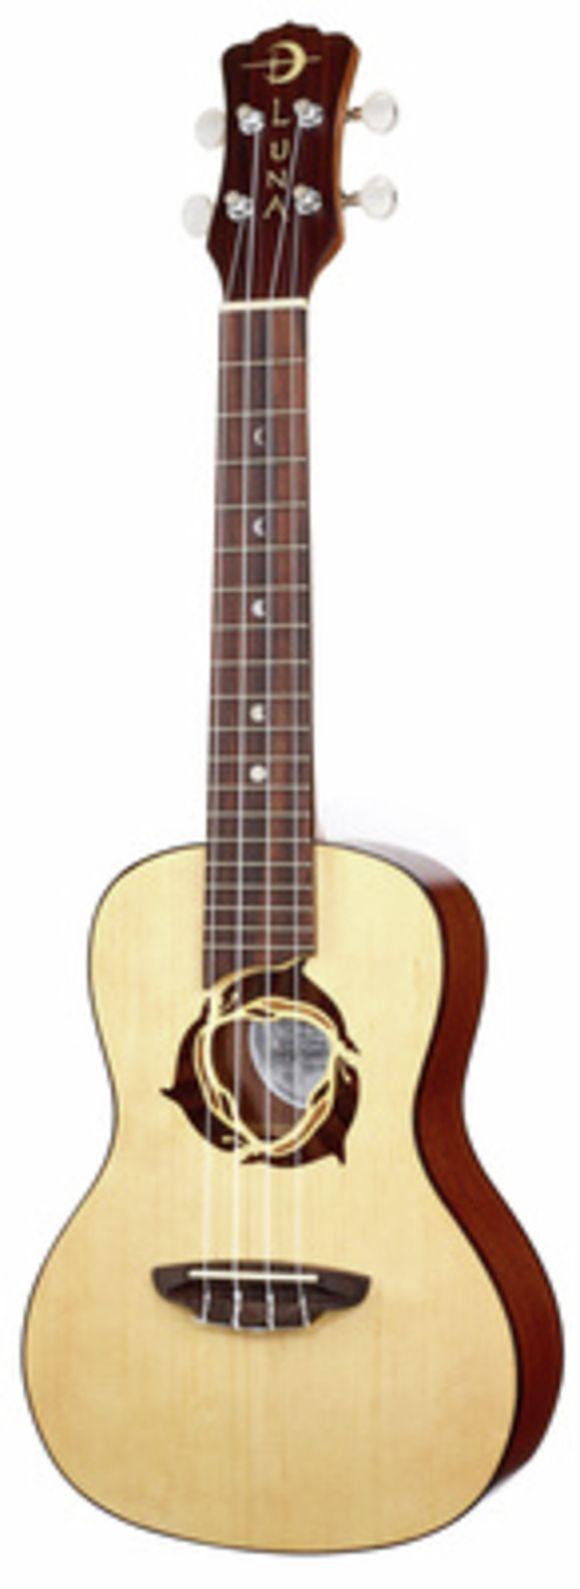 Uke Dolphin Concert Luna Guitars